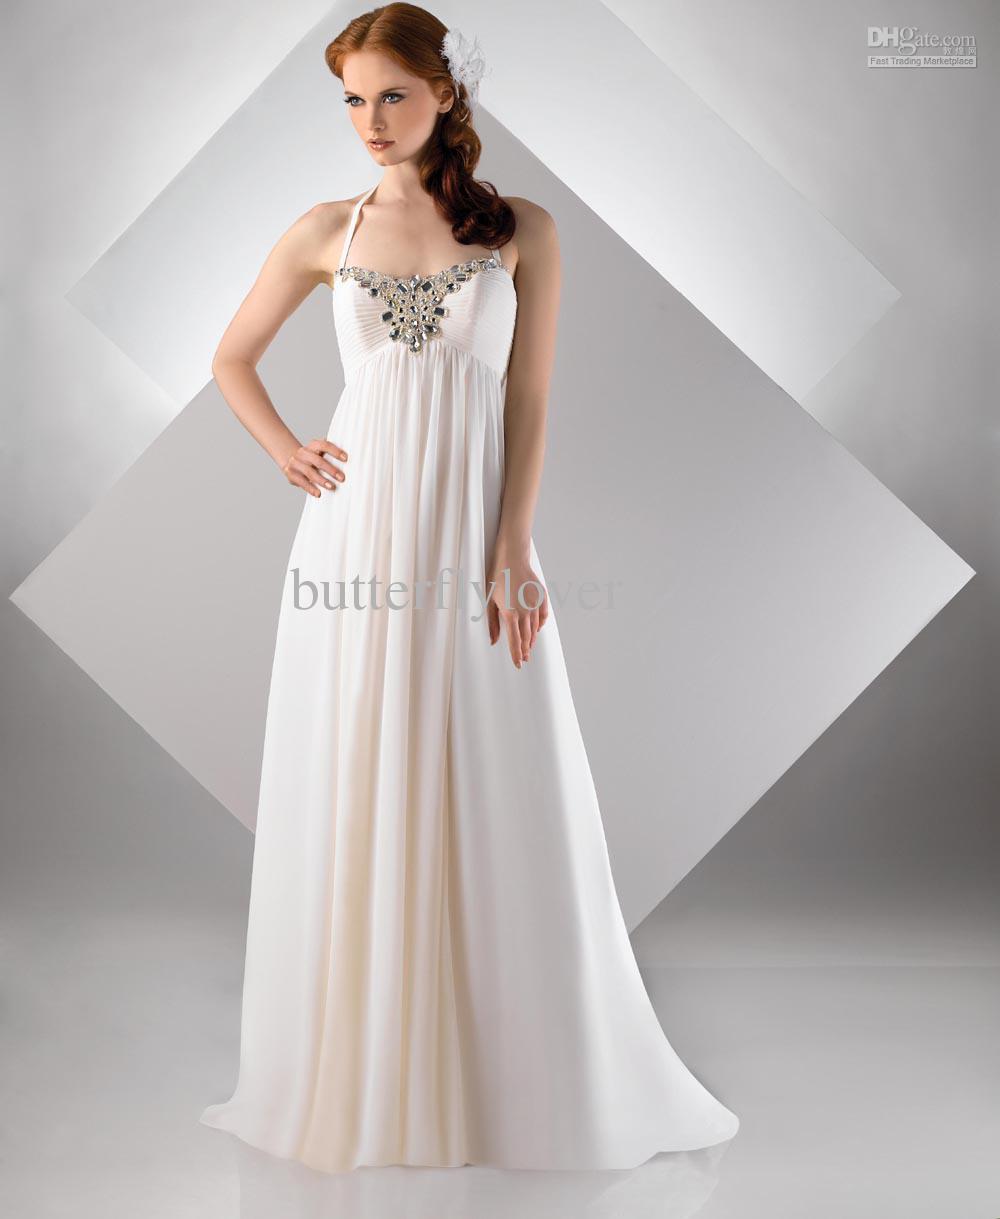 wedding maternity dresses maternity dresses for wedding Wedding Maternity Dresses 42